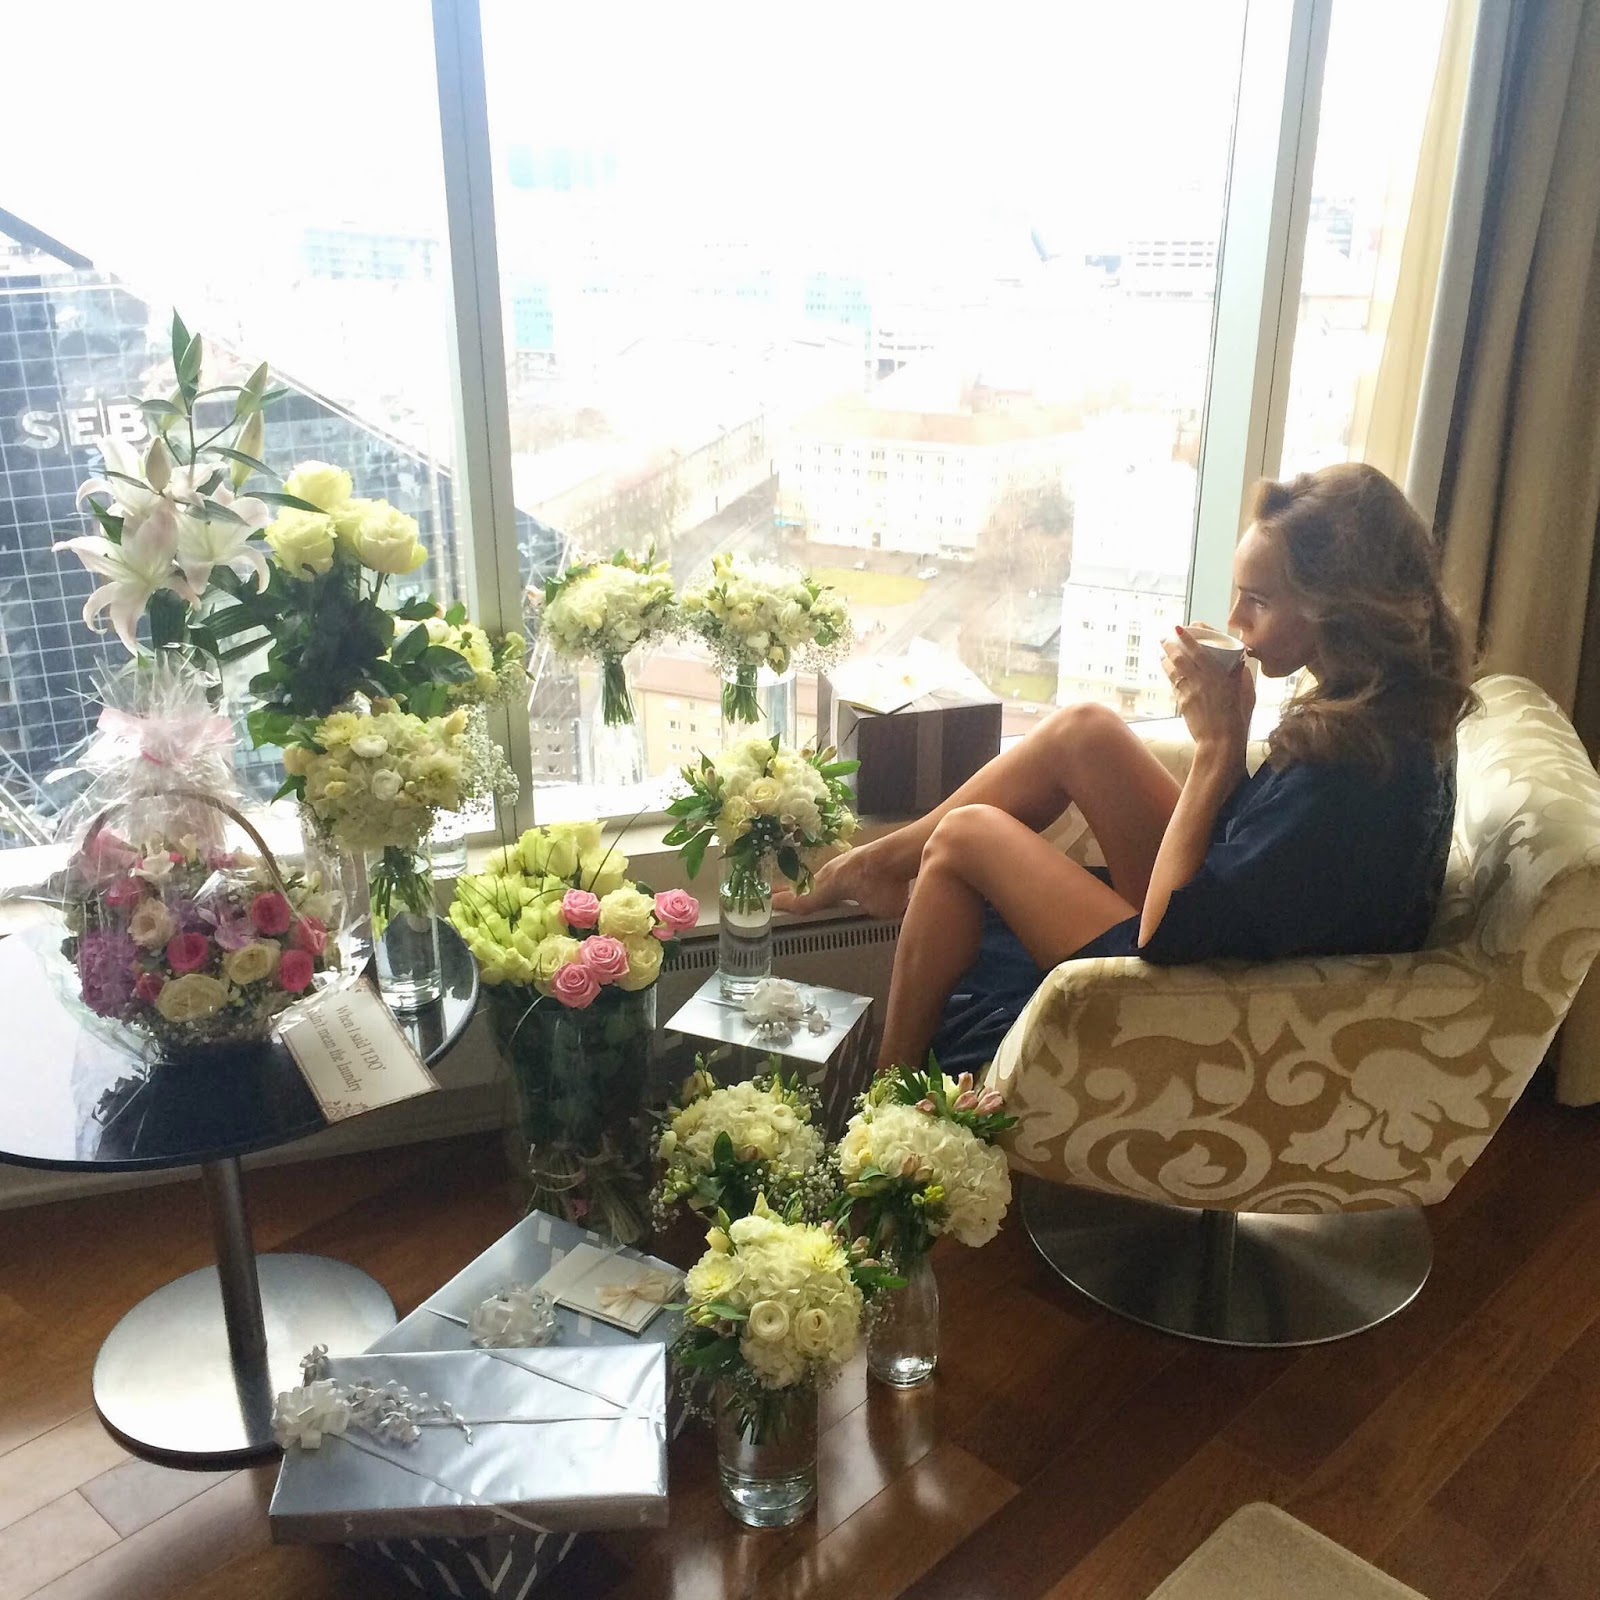 swissotel-tallinn-room-wedding-flowers-girl-morning-coffee-view